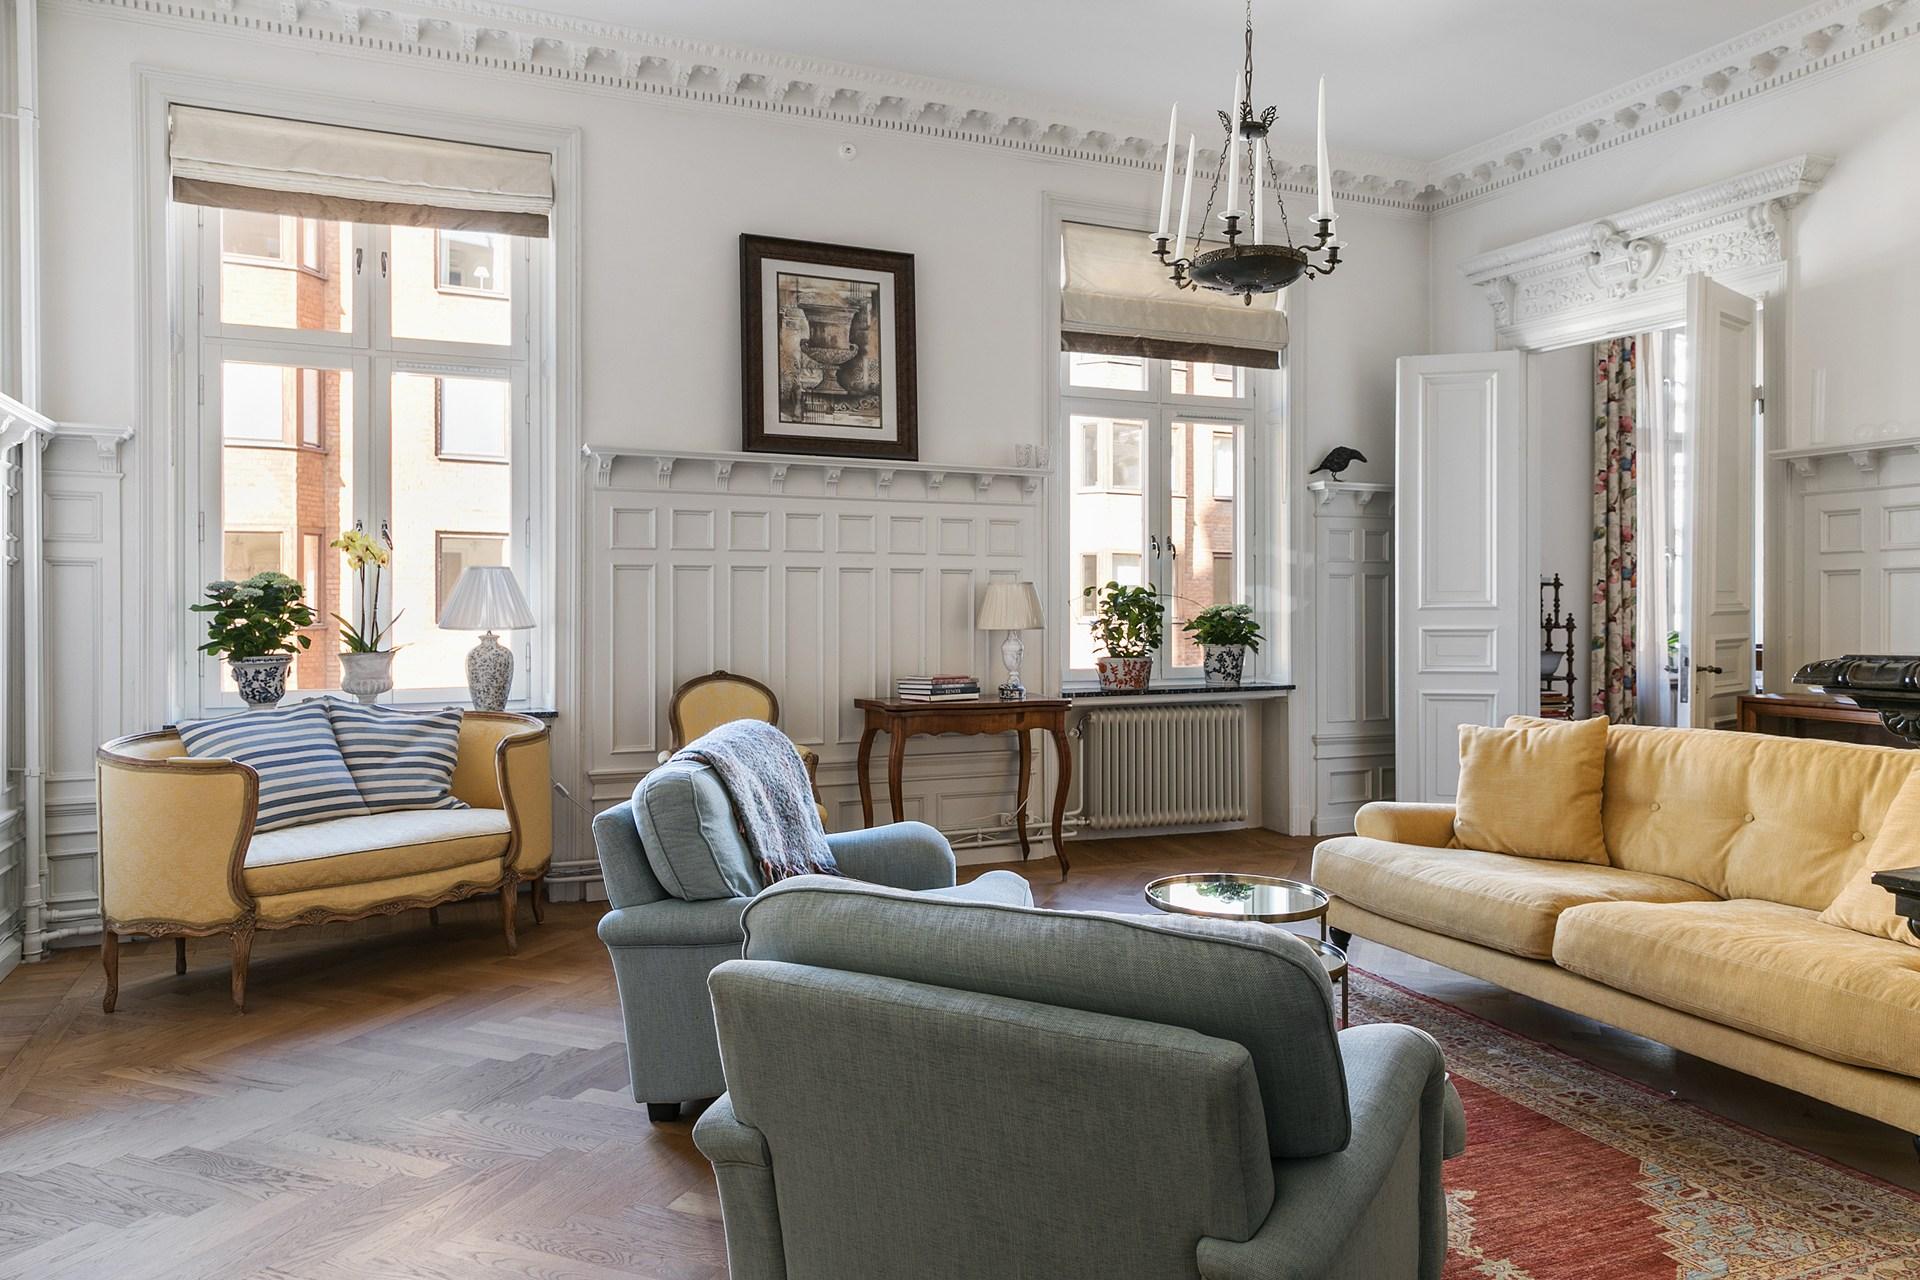 гостиная мягкая мебель паркет лепнина